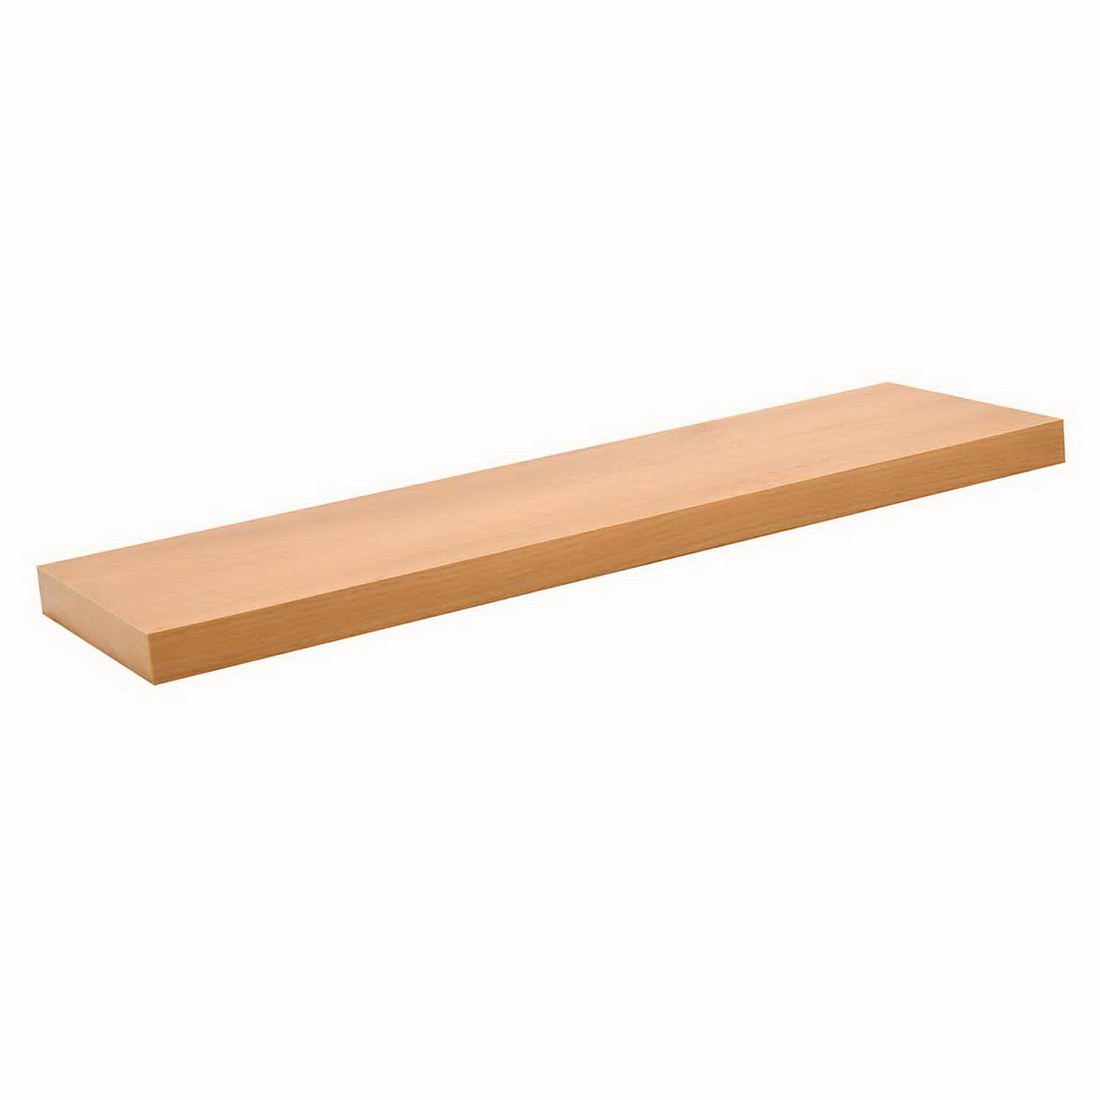 800x250x38mm Floating Shelf Scandi Oak